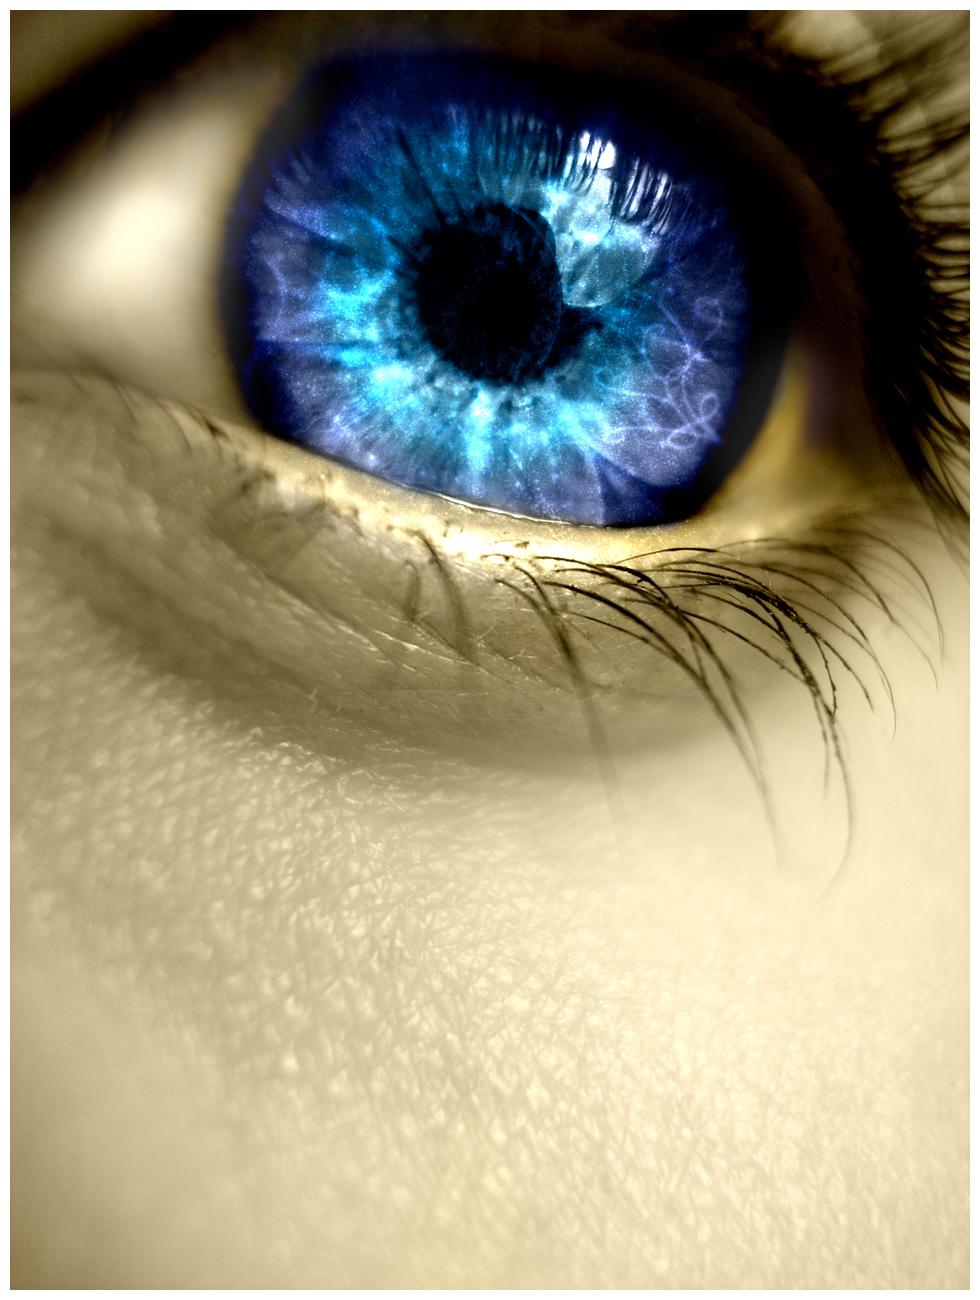 15 Excellent Digital Eyes Images Xemanhdep Photos